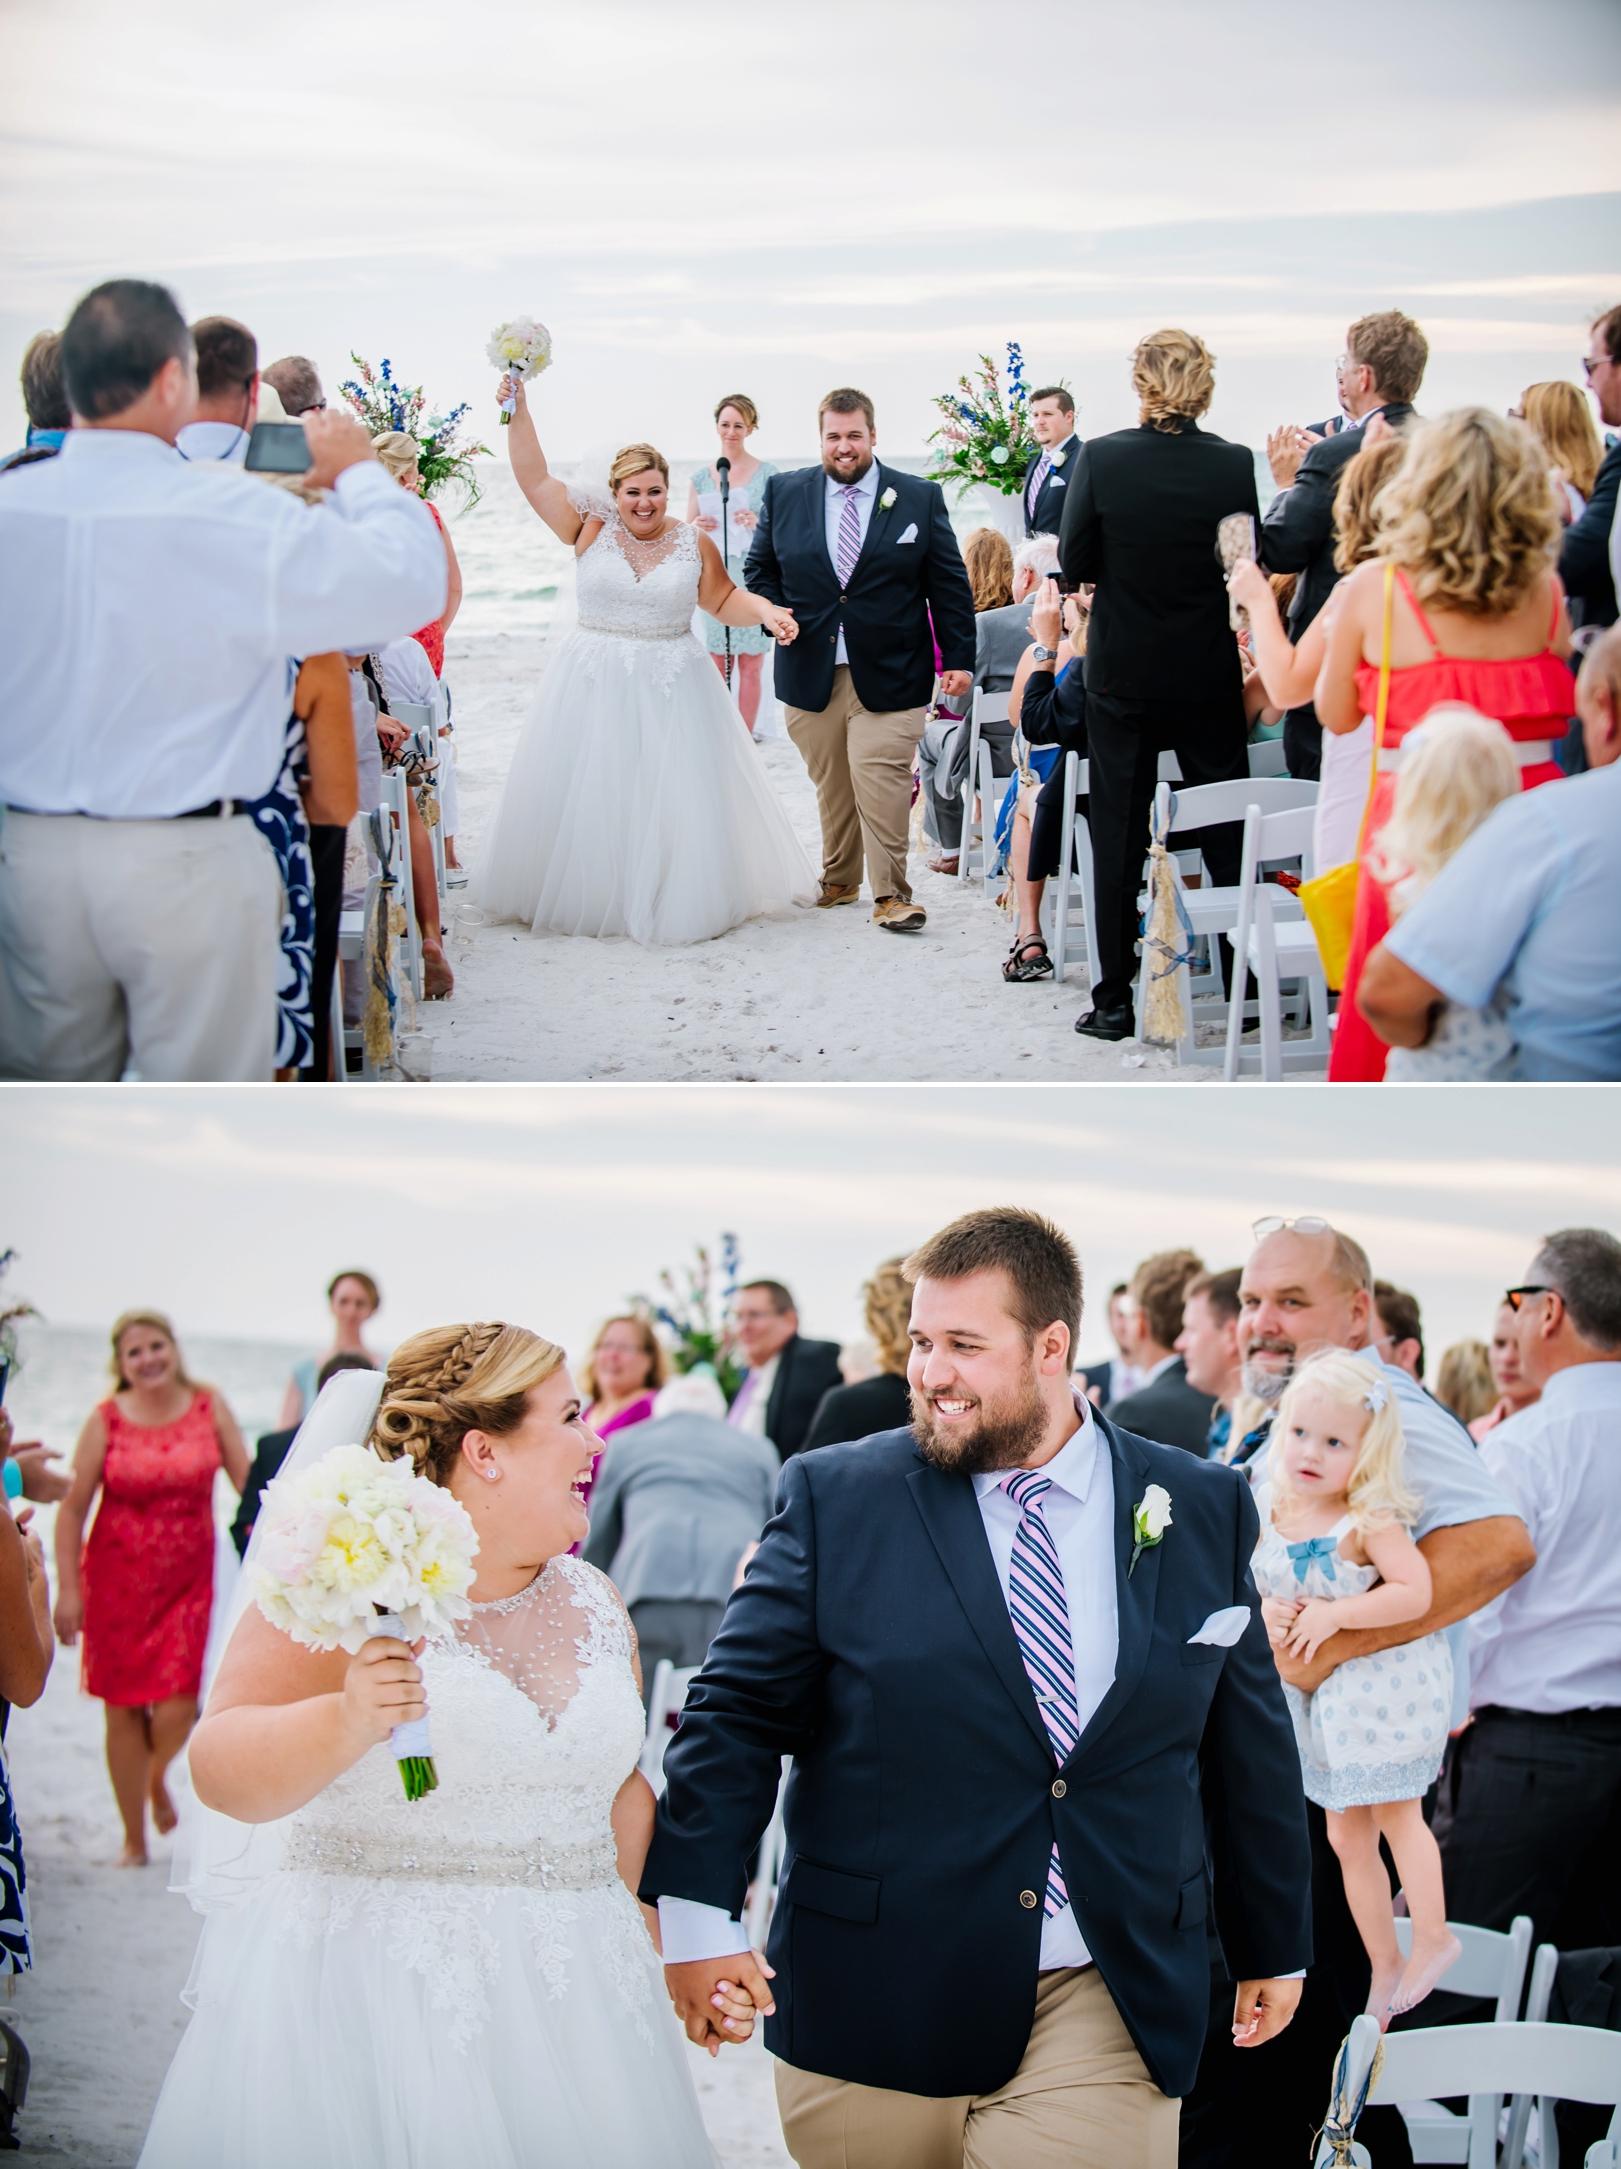 St-pete-wedding-photographer-don-caesar-ashlee-hamon_0018.jpg